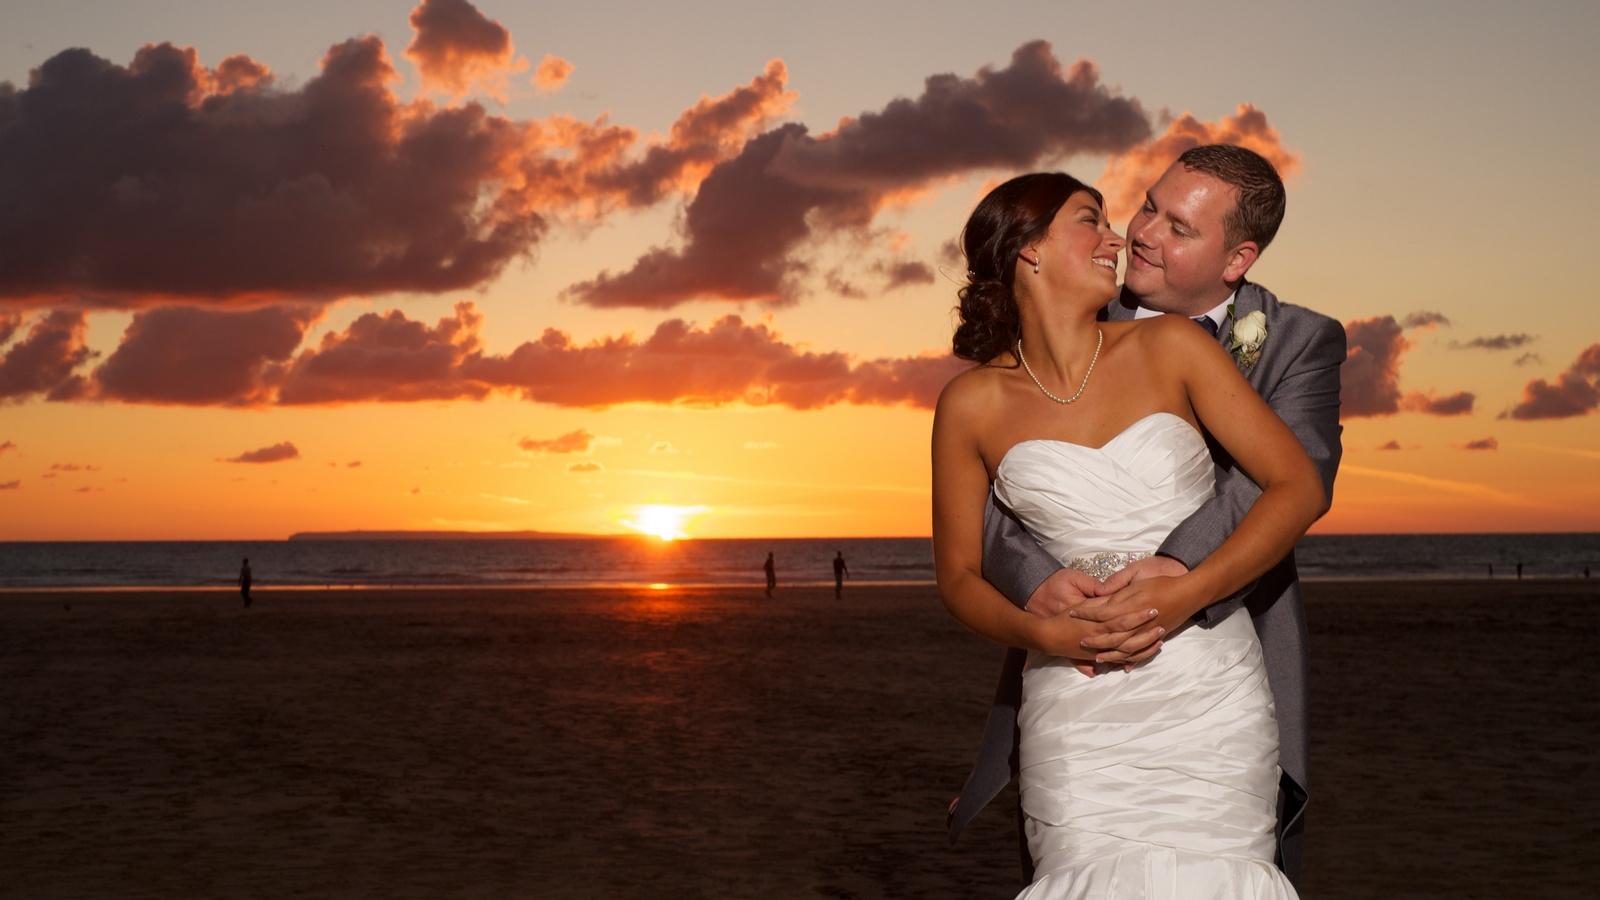 04_Sunset wedding embrace.jpg